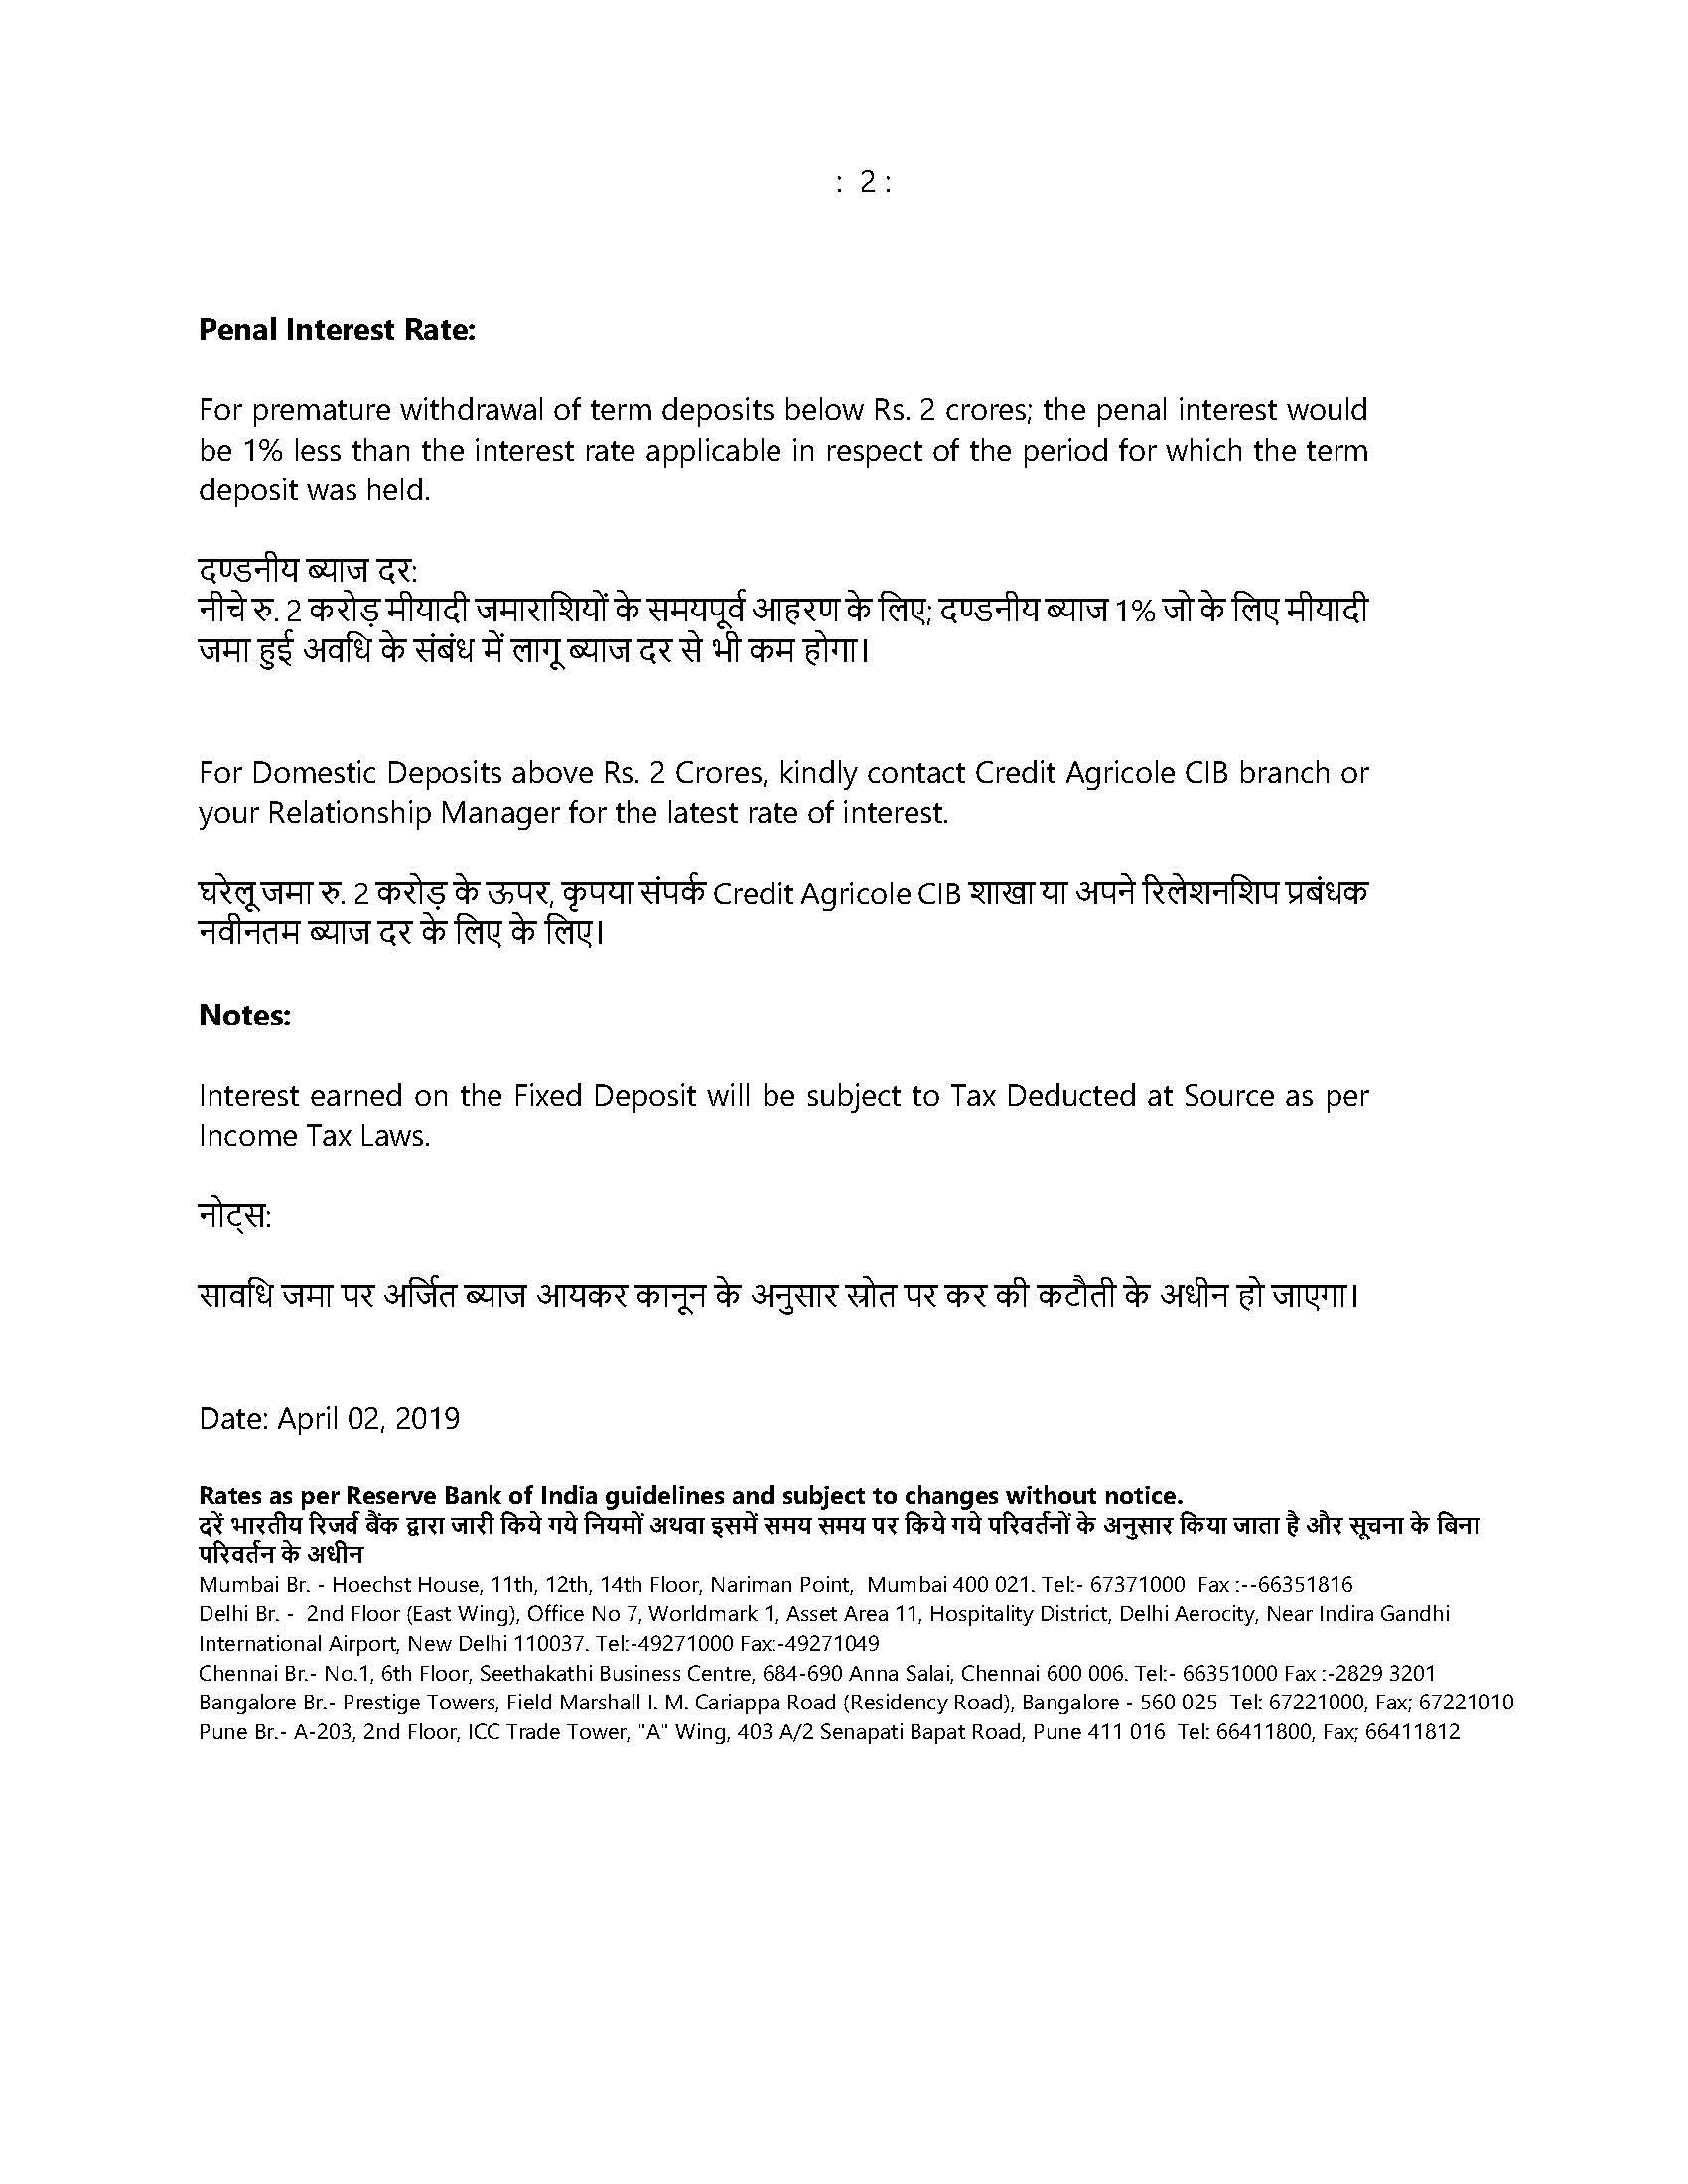 India | Crédit Agricole CIB